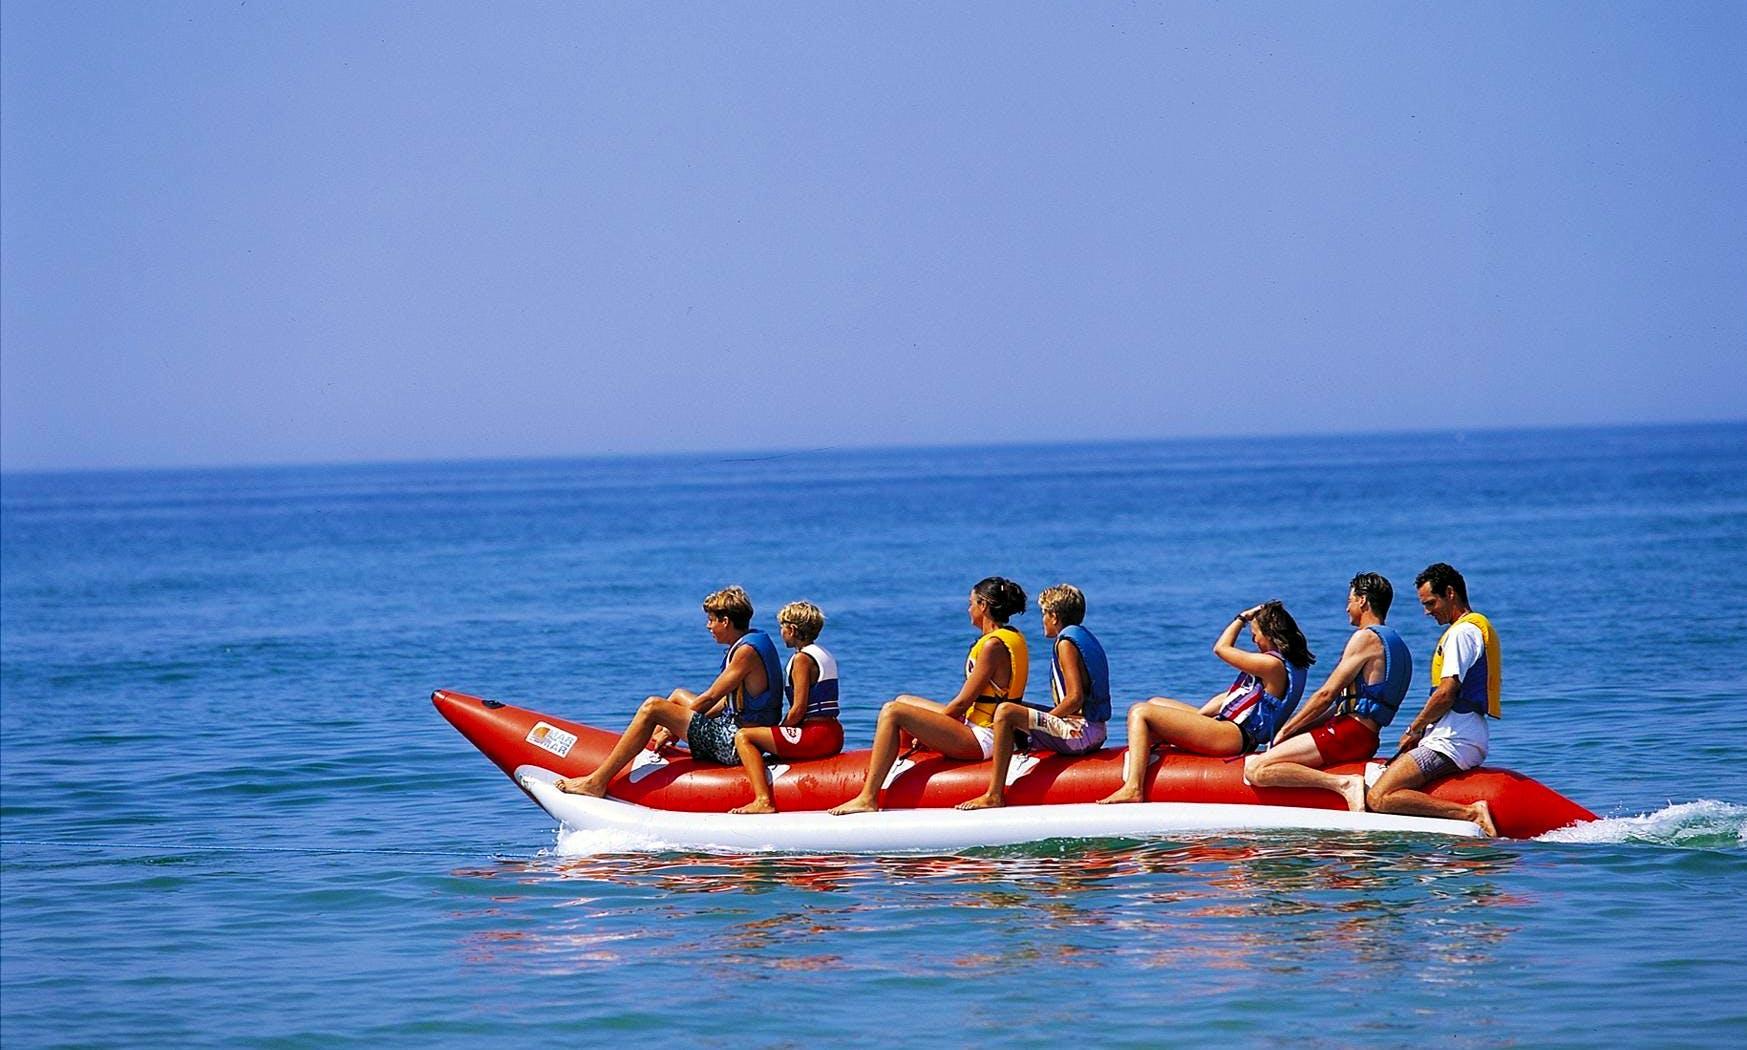 Fun Banana Boat Rides for 15-Minutes in Faro, Portugal